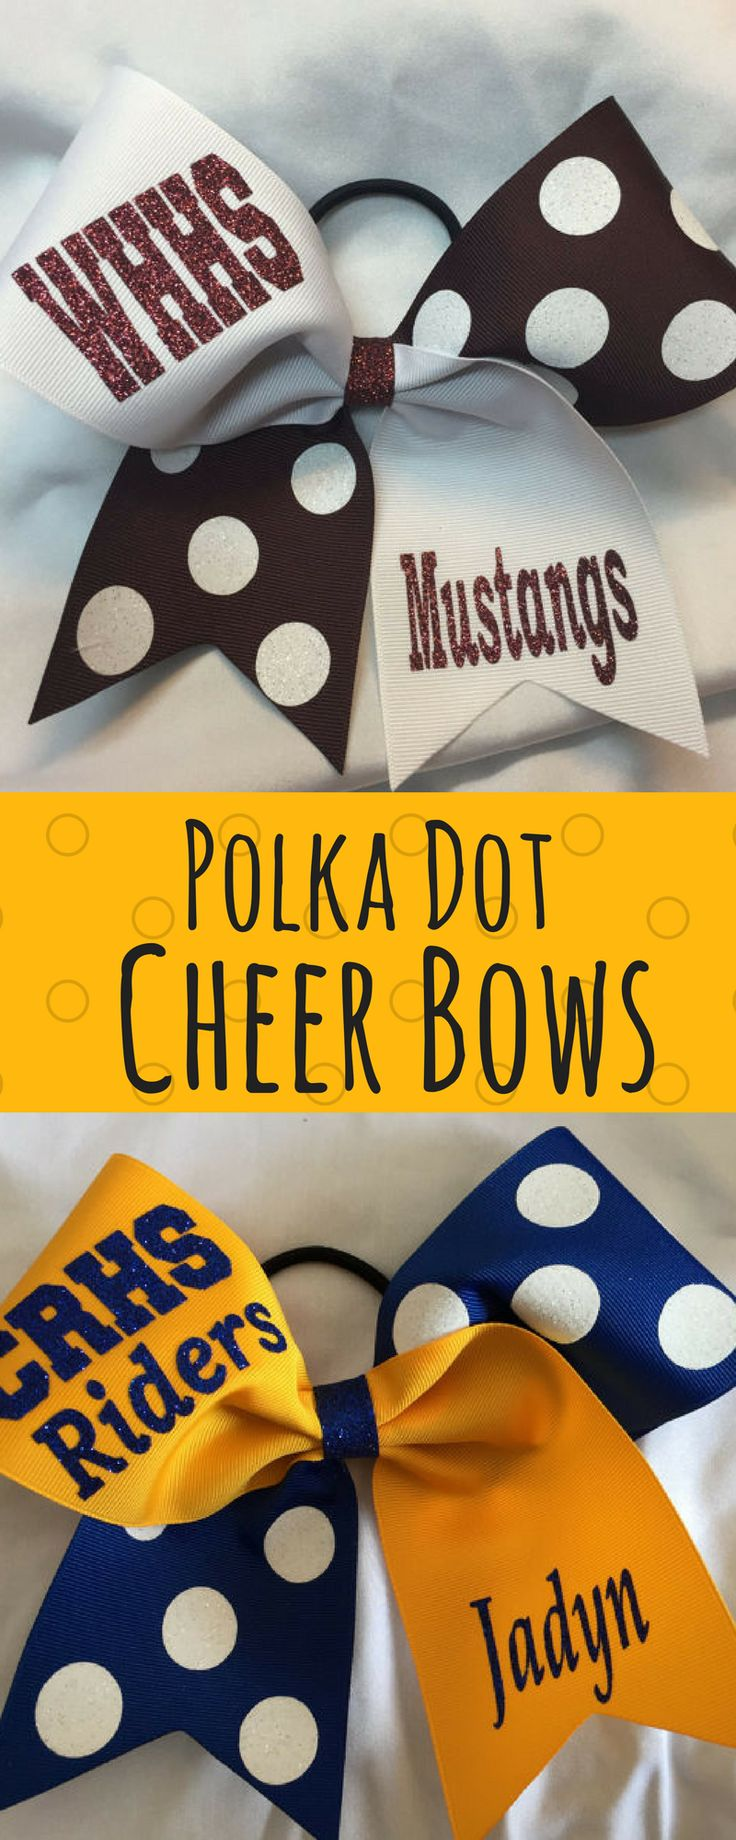 Grosgrain Custom Polka Dot Cheer Bow. Cheerleading hair bows. Custom and polka dot pattern. Cute cheer bows! #cheerleading #ad